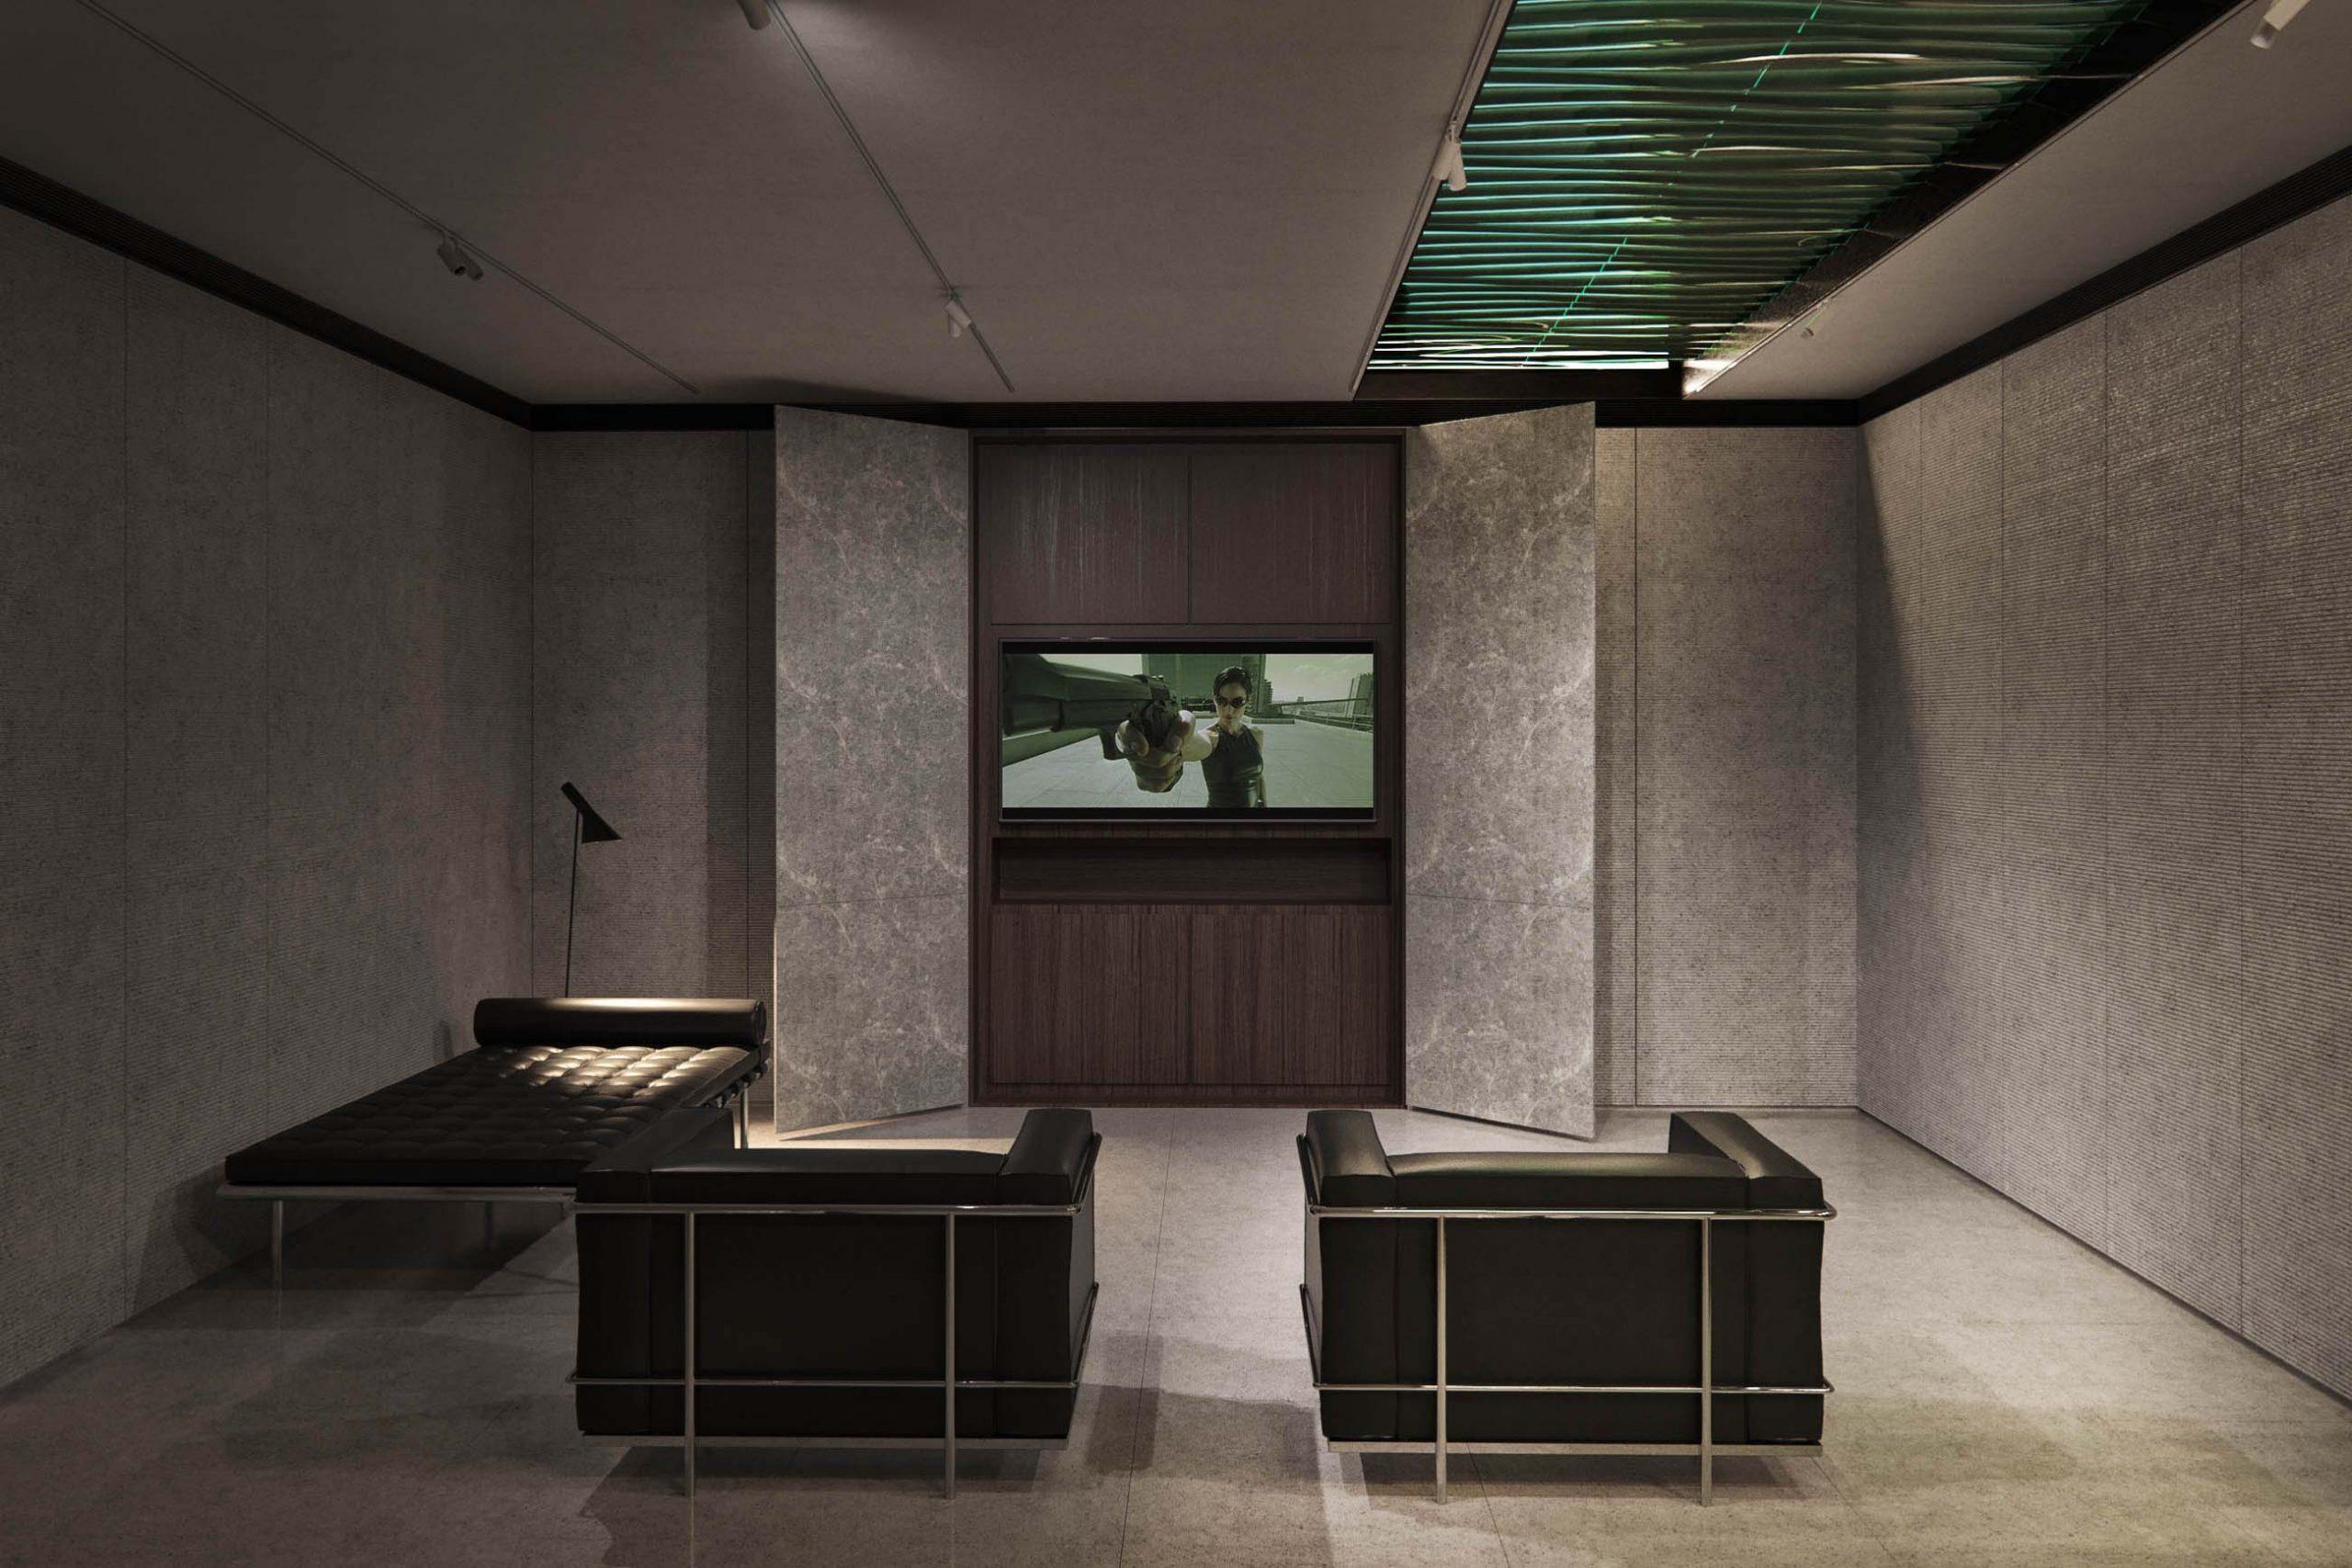 https://dprostudio.com/wp-content/uploads/2020/11/Lounge2-scaled.jpg